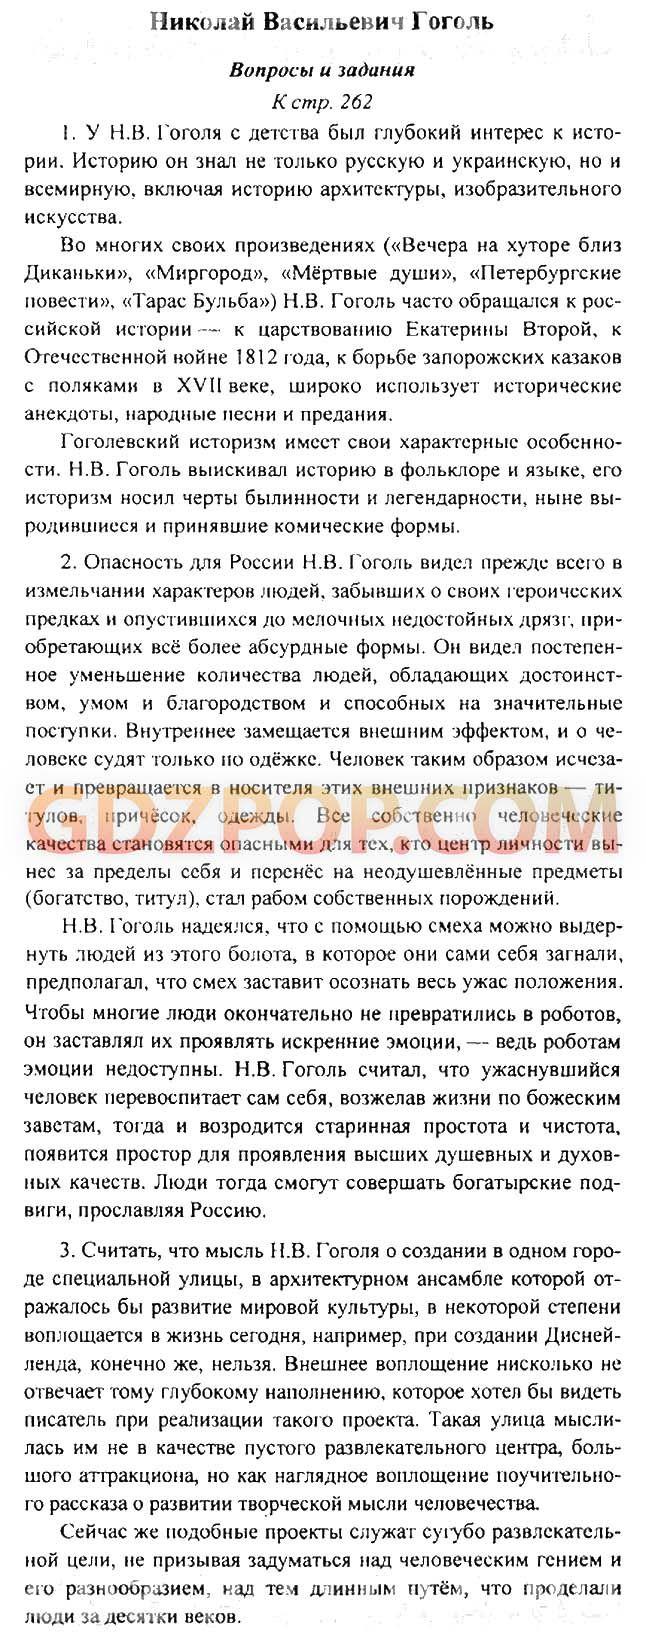 Дз этика 6 класс оксана данилевская